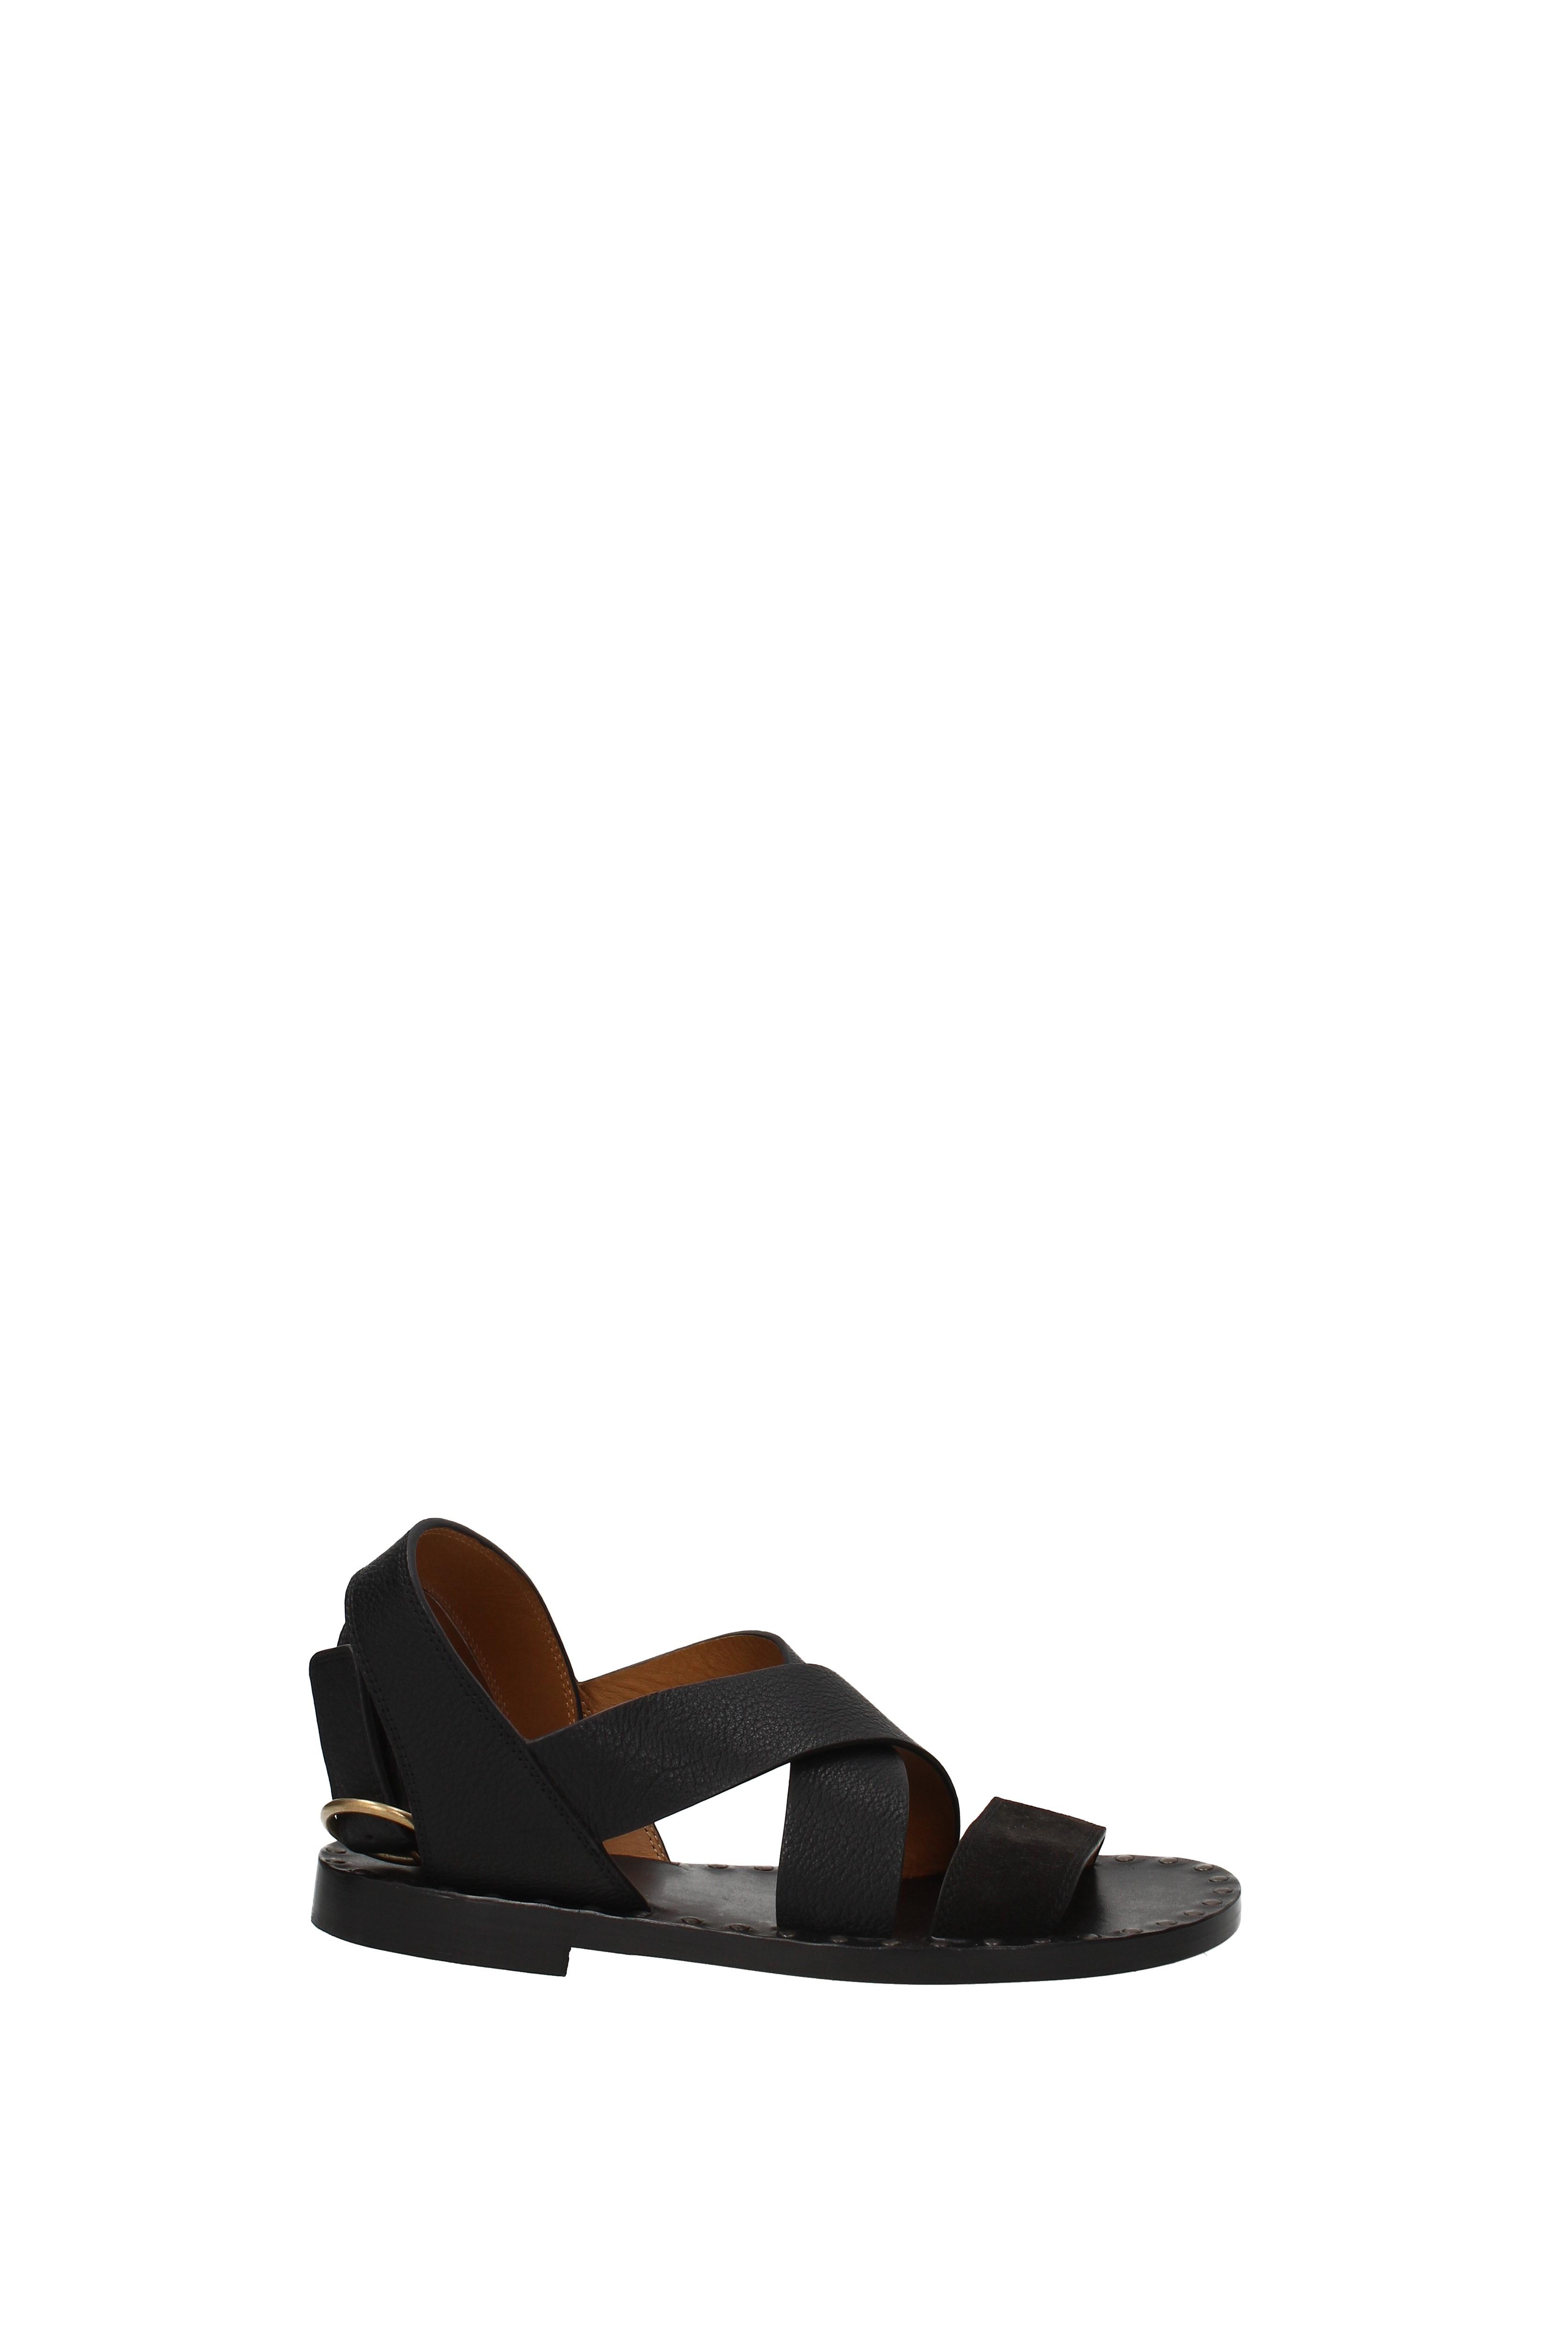 Sandals Women Chloé Women Sandals -  Leder (CH30152E18) c3574a